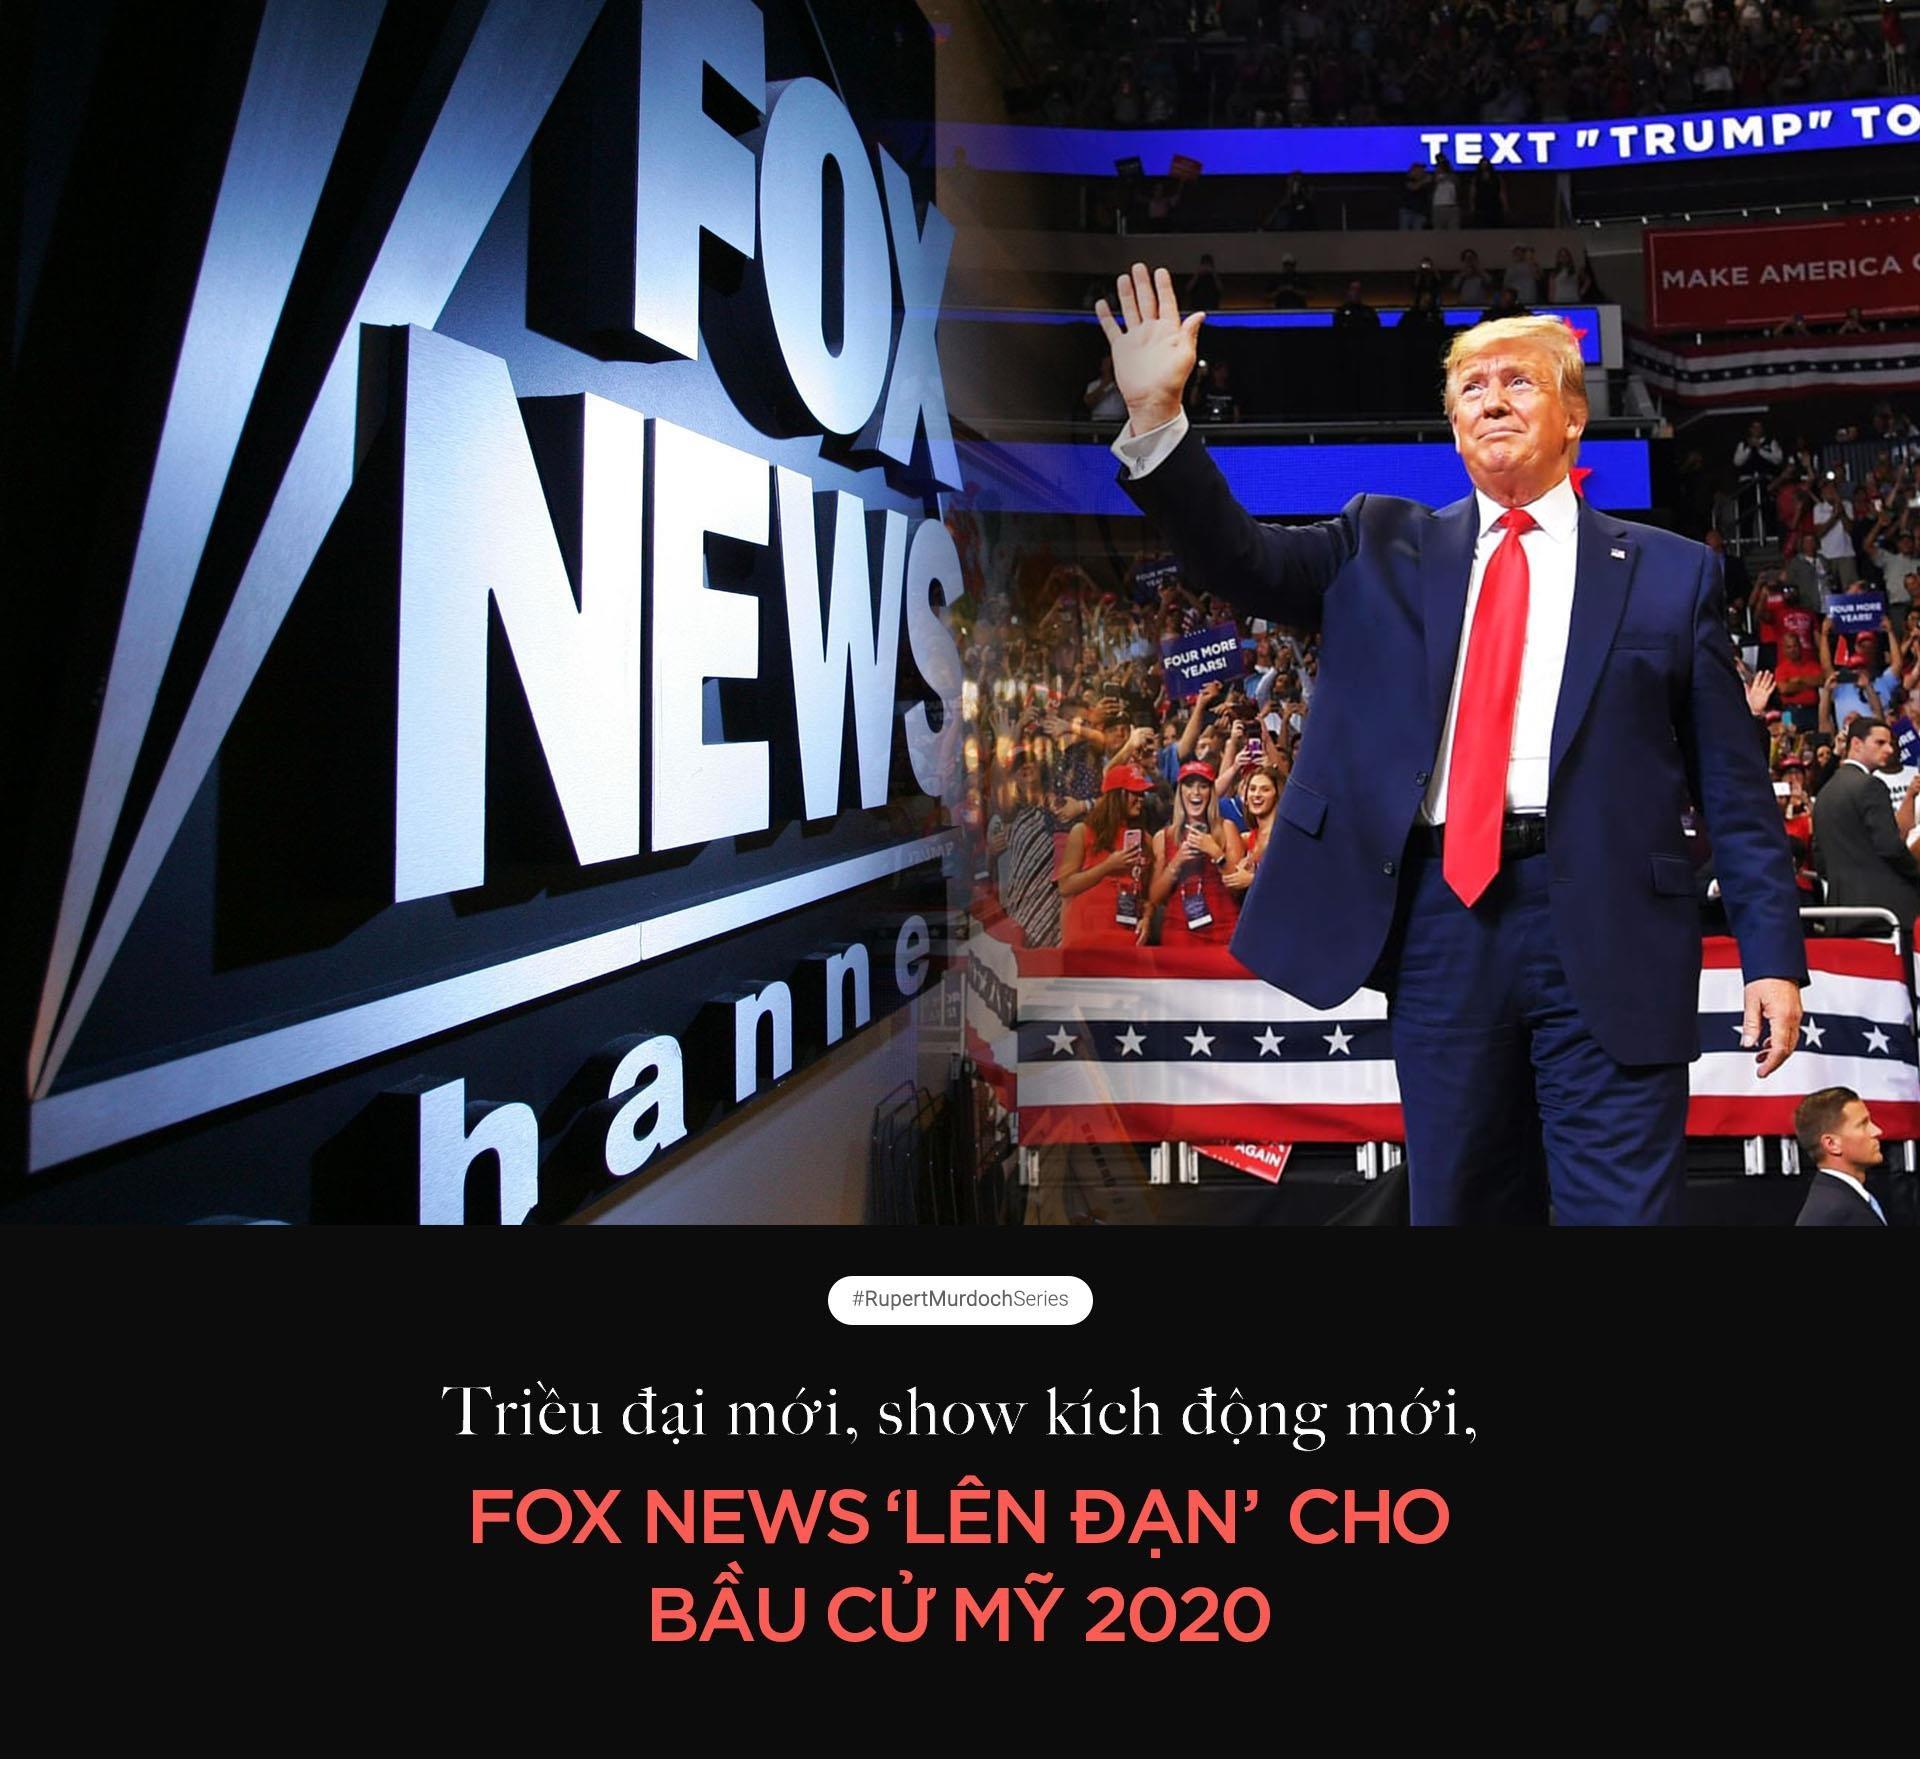 Fox News, trieu dai Murdoch len dan cho canh bac bau cu 2020 hinh anh 2